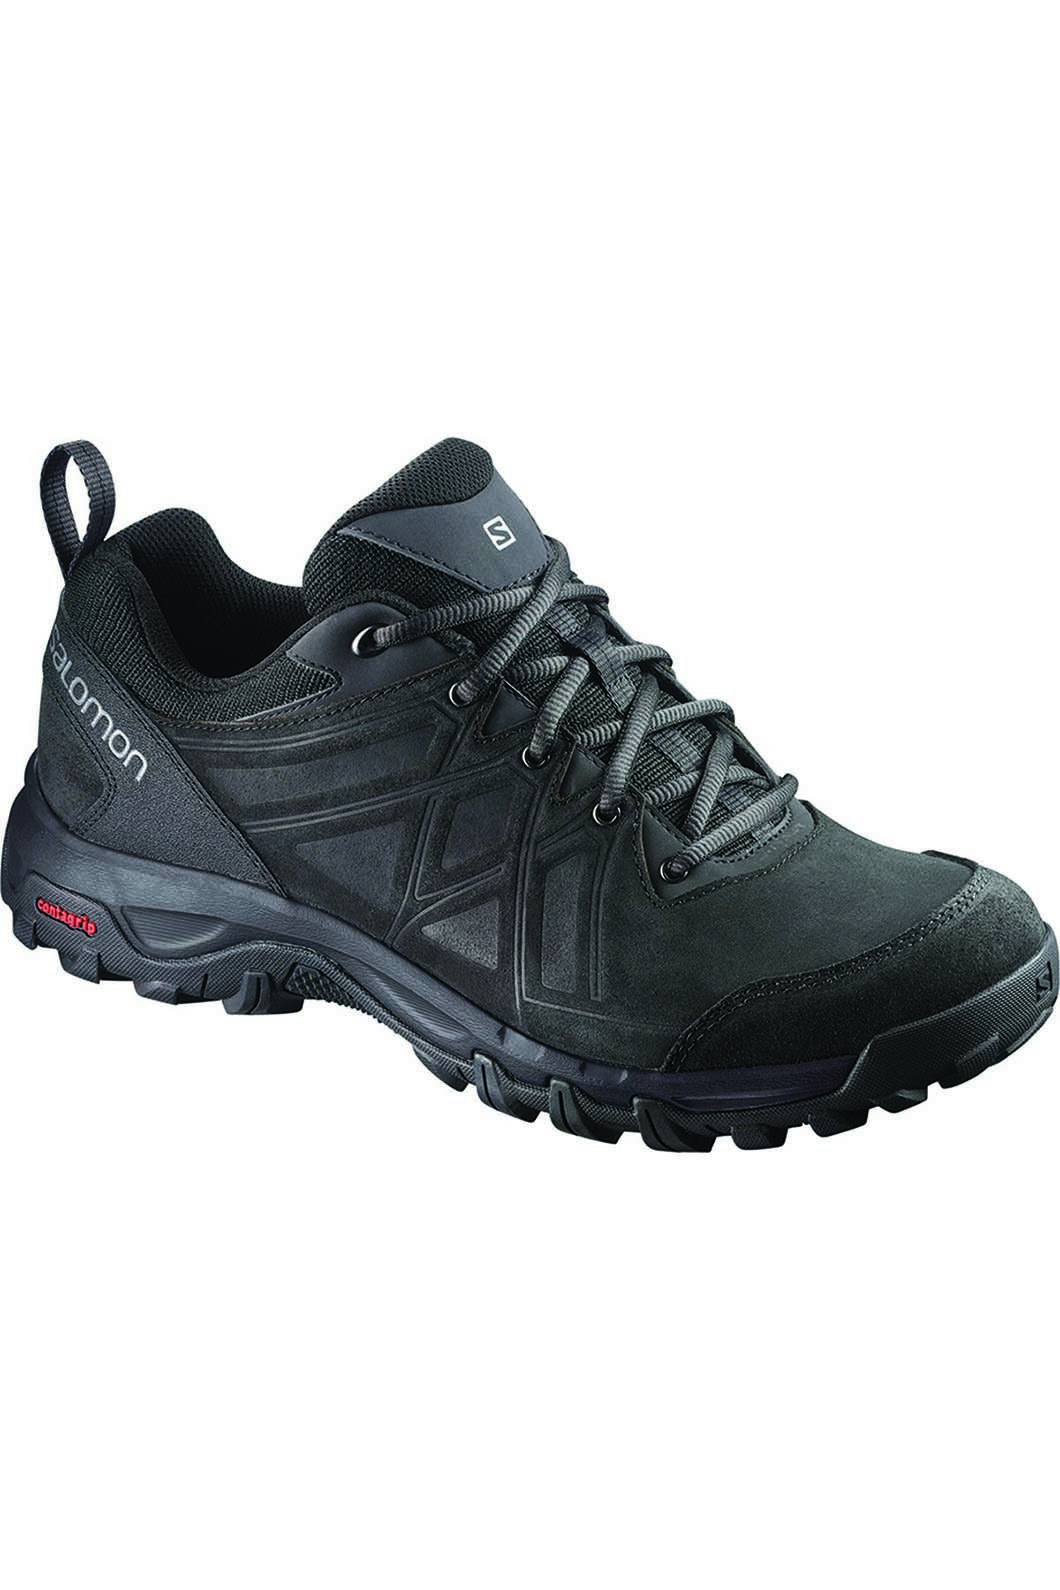 Salomon Men's Evasion 2 GTX Hiking Shoe, Black, hi-res